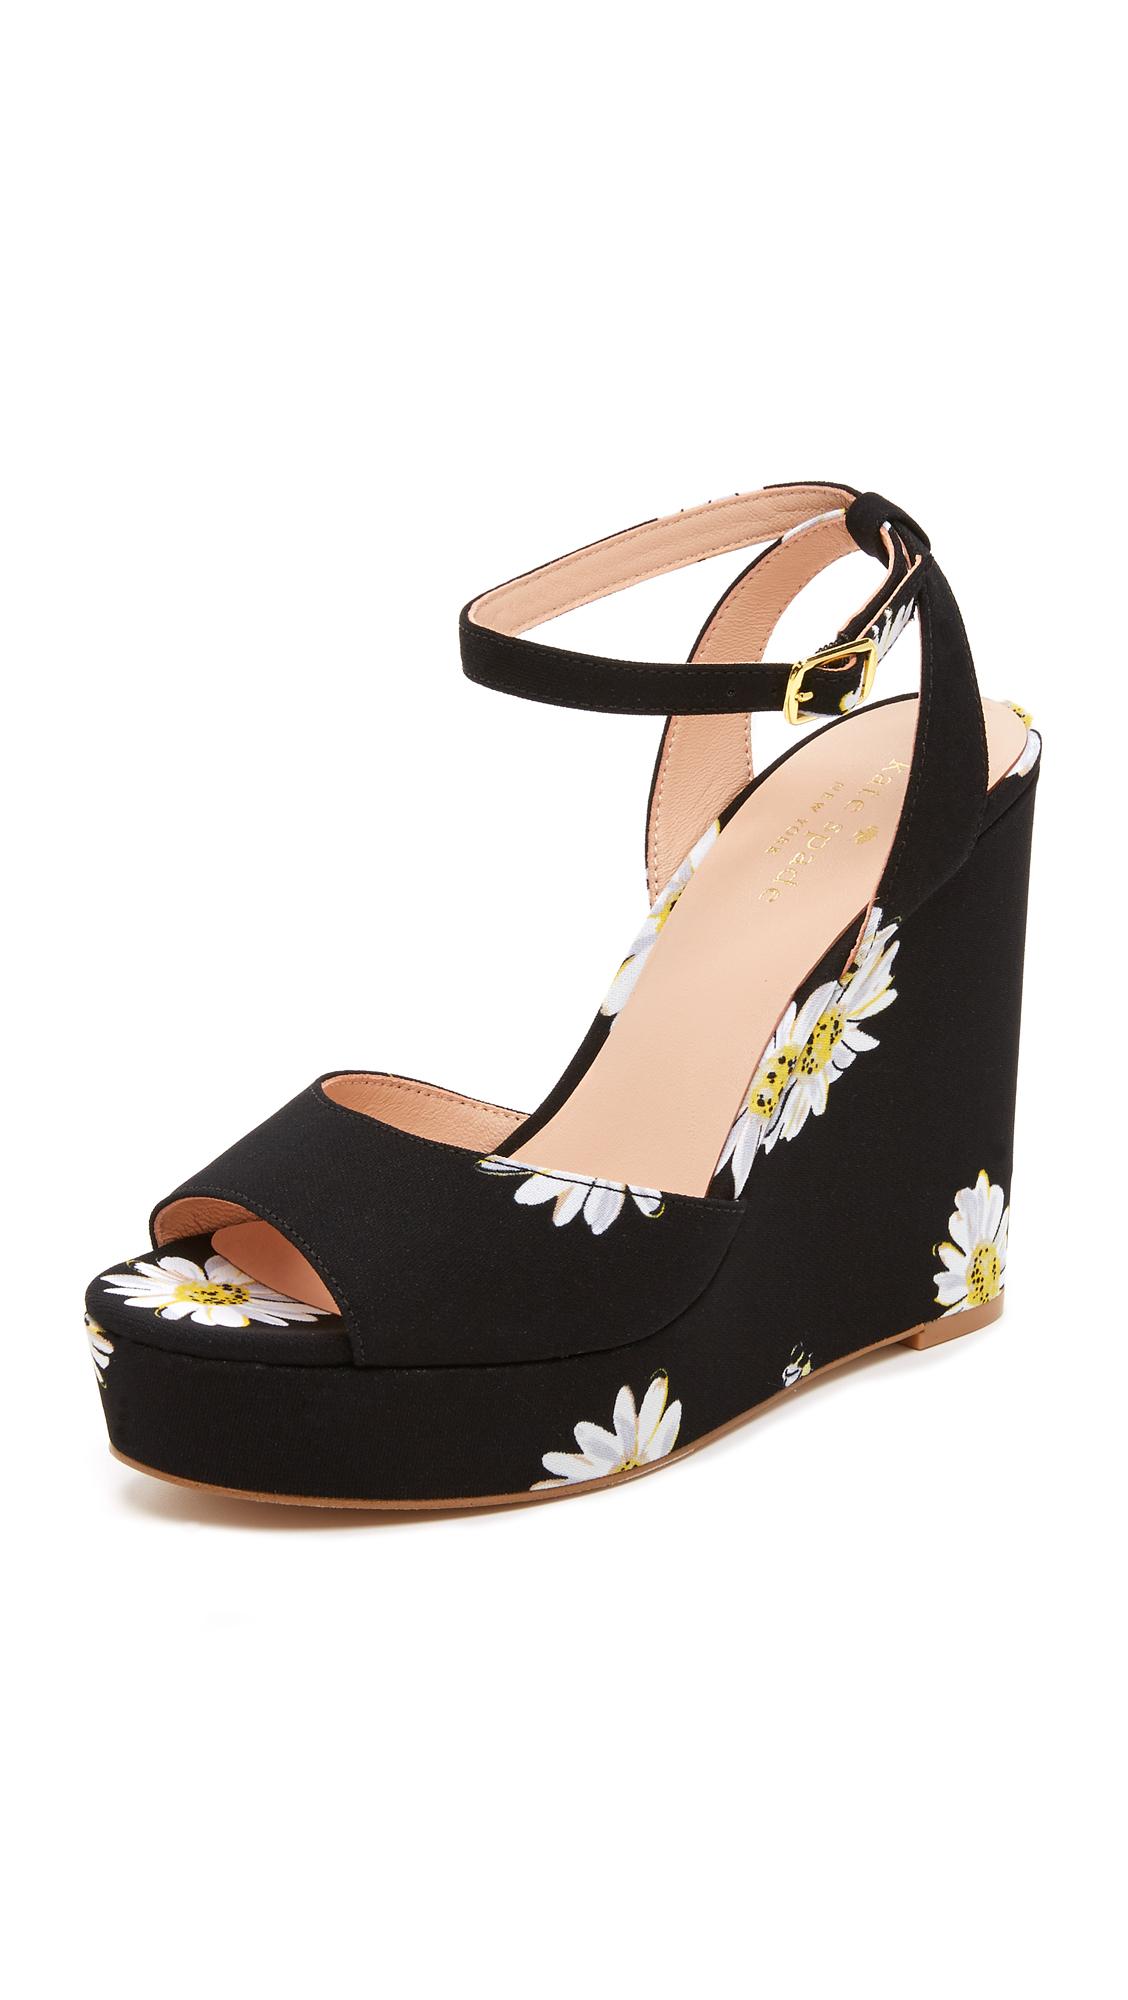 Lyst Kate Spade Dellie Wedge Sandals In Black